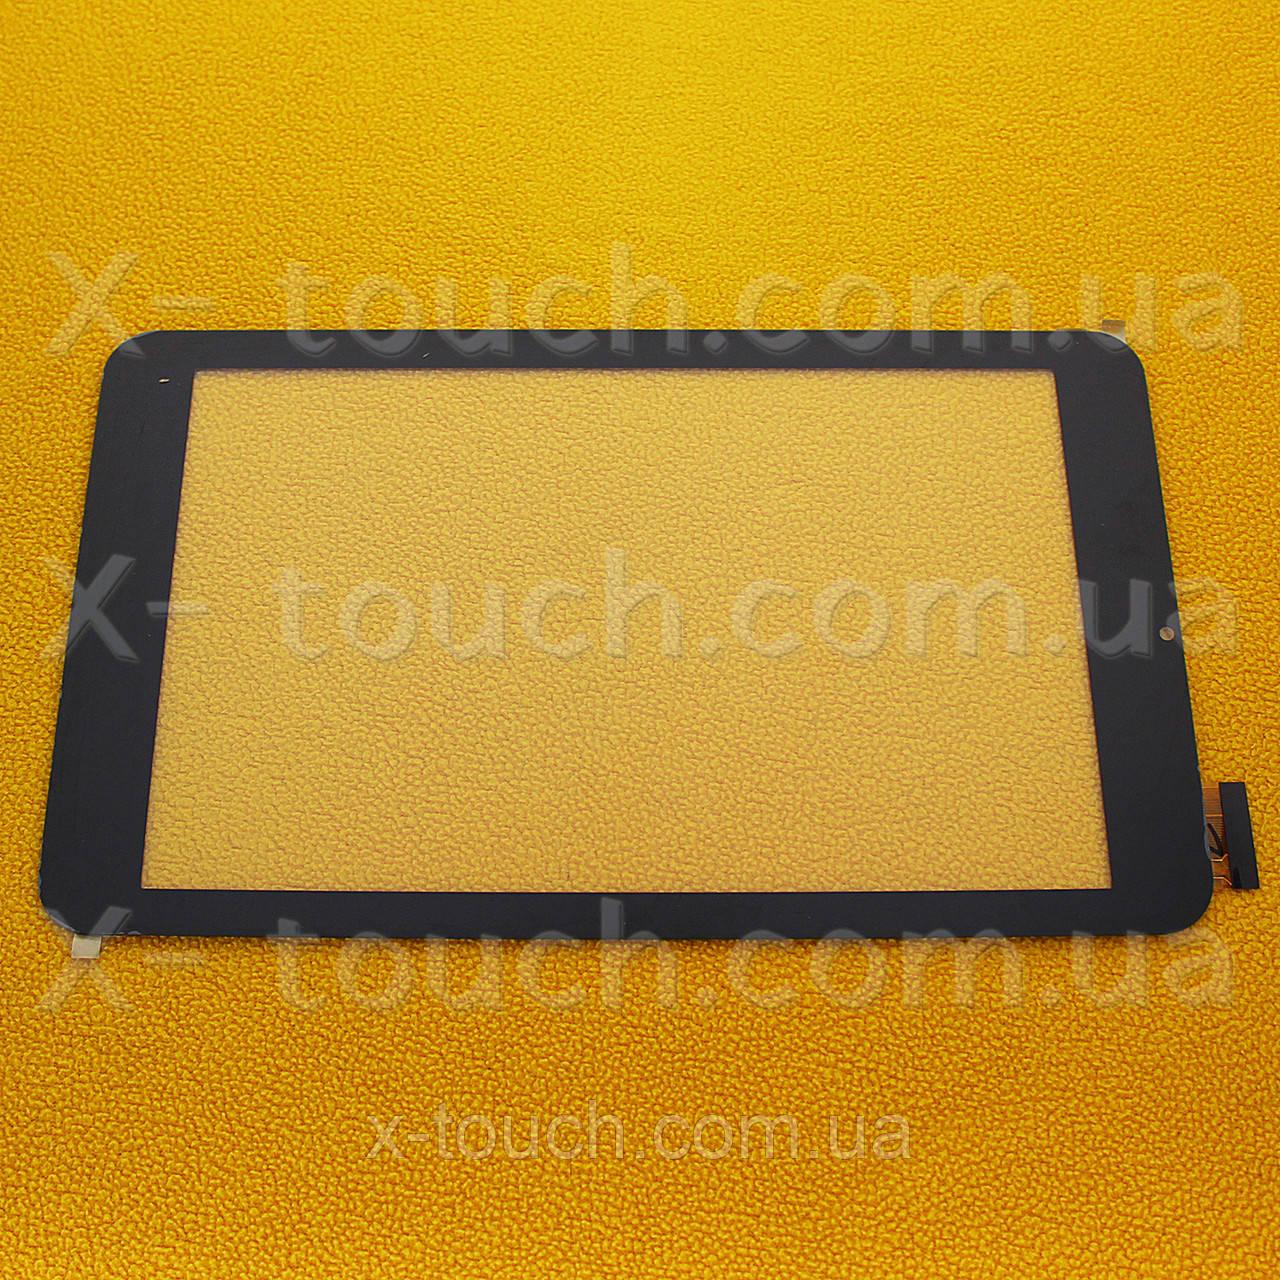 Тачскрин, сенсор  XC-PG0800-012B-A1-FPC  для планшета